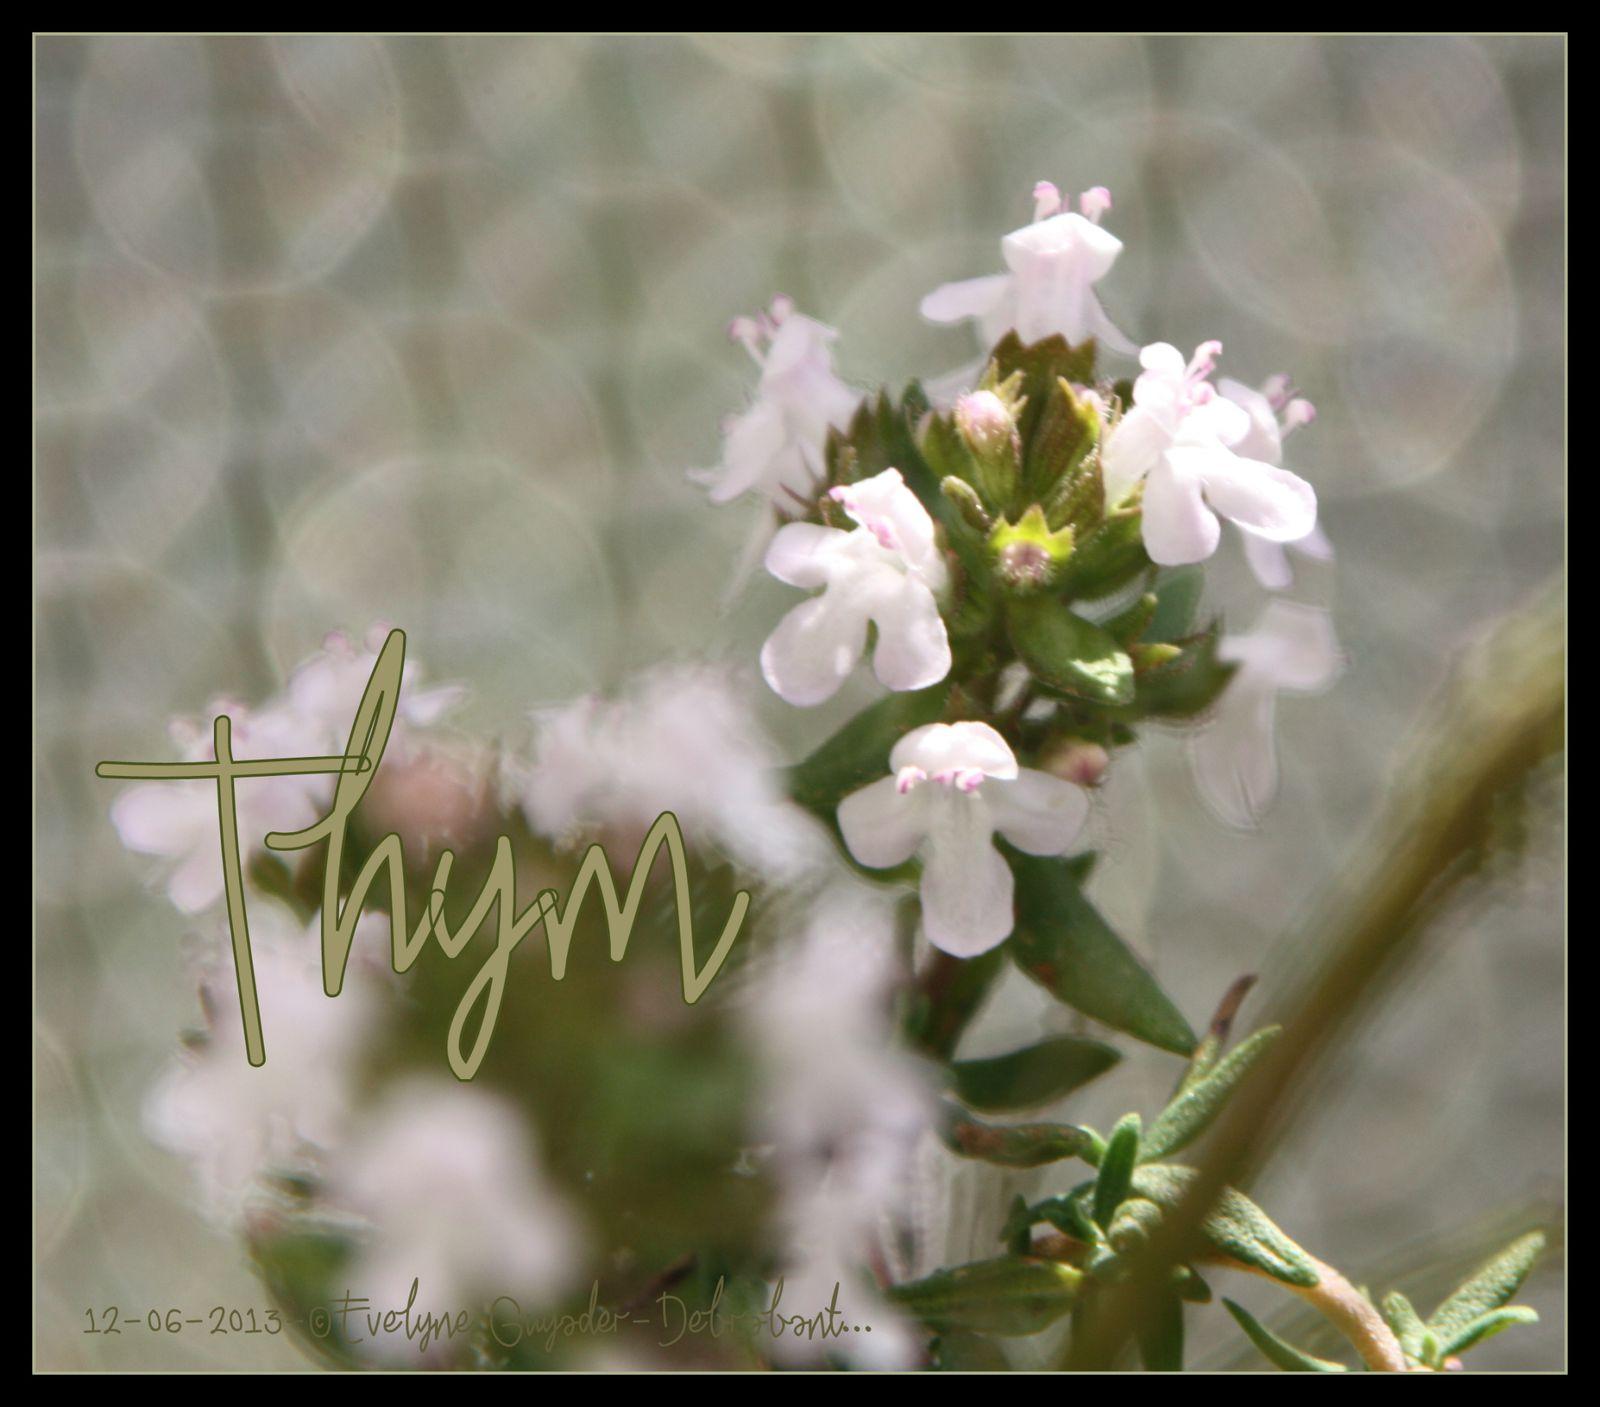 Thym nom masculin plante aromatique utilis e en cuisine for Plante synonyme